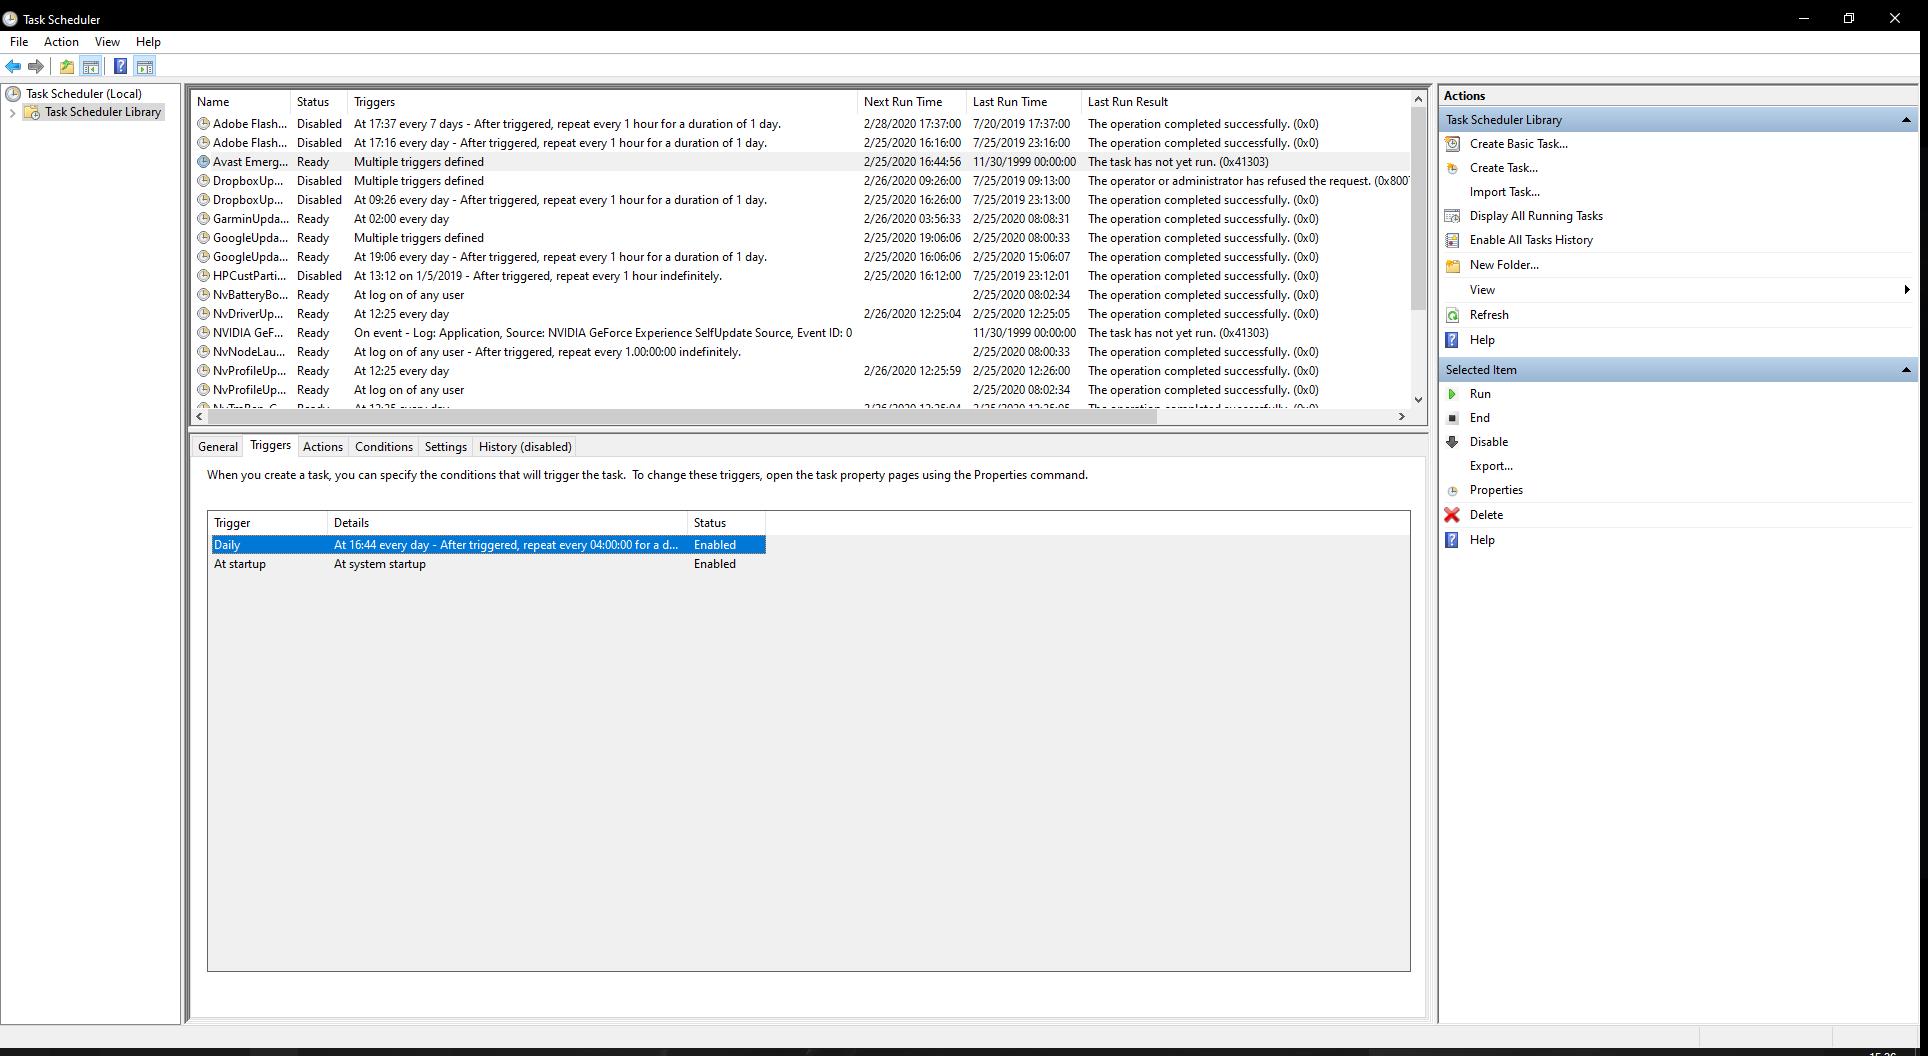 Screenshot of the Win10 Task Scheduler